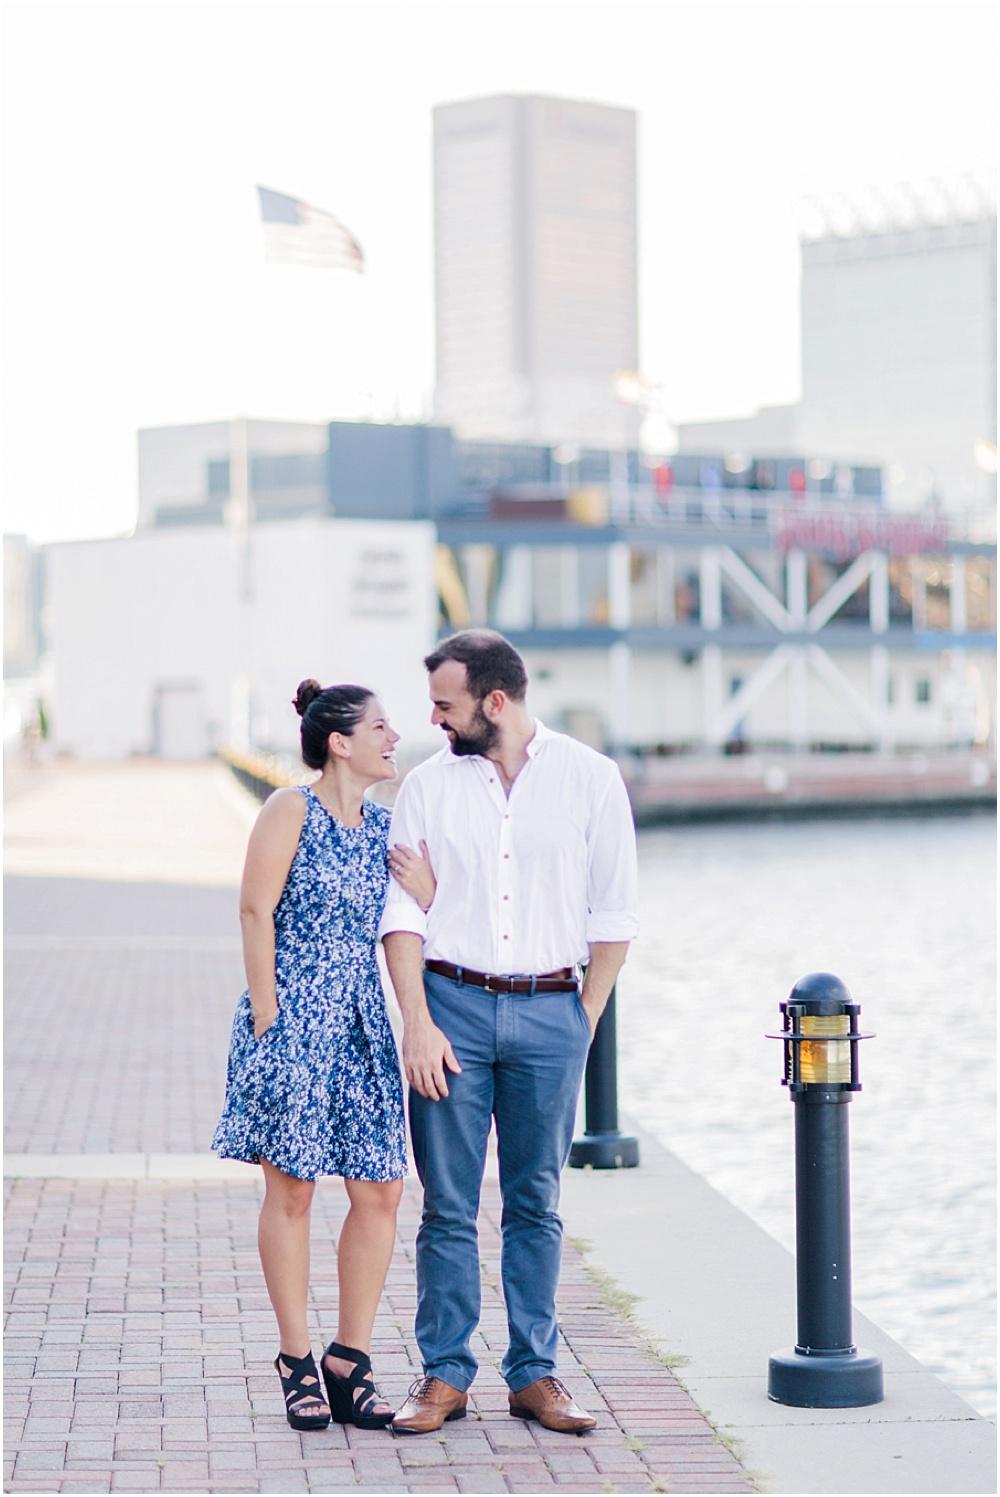 Liz_Robert_Federal_Hill_Engagement_Session_Baltimore_Wedding_Photographer_0010